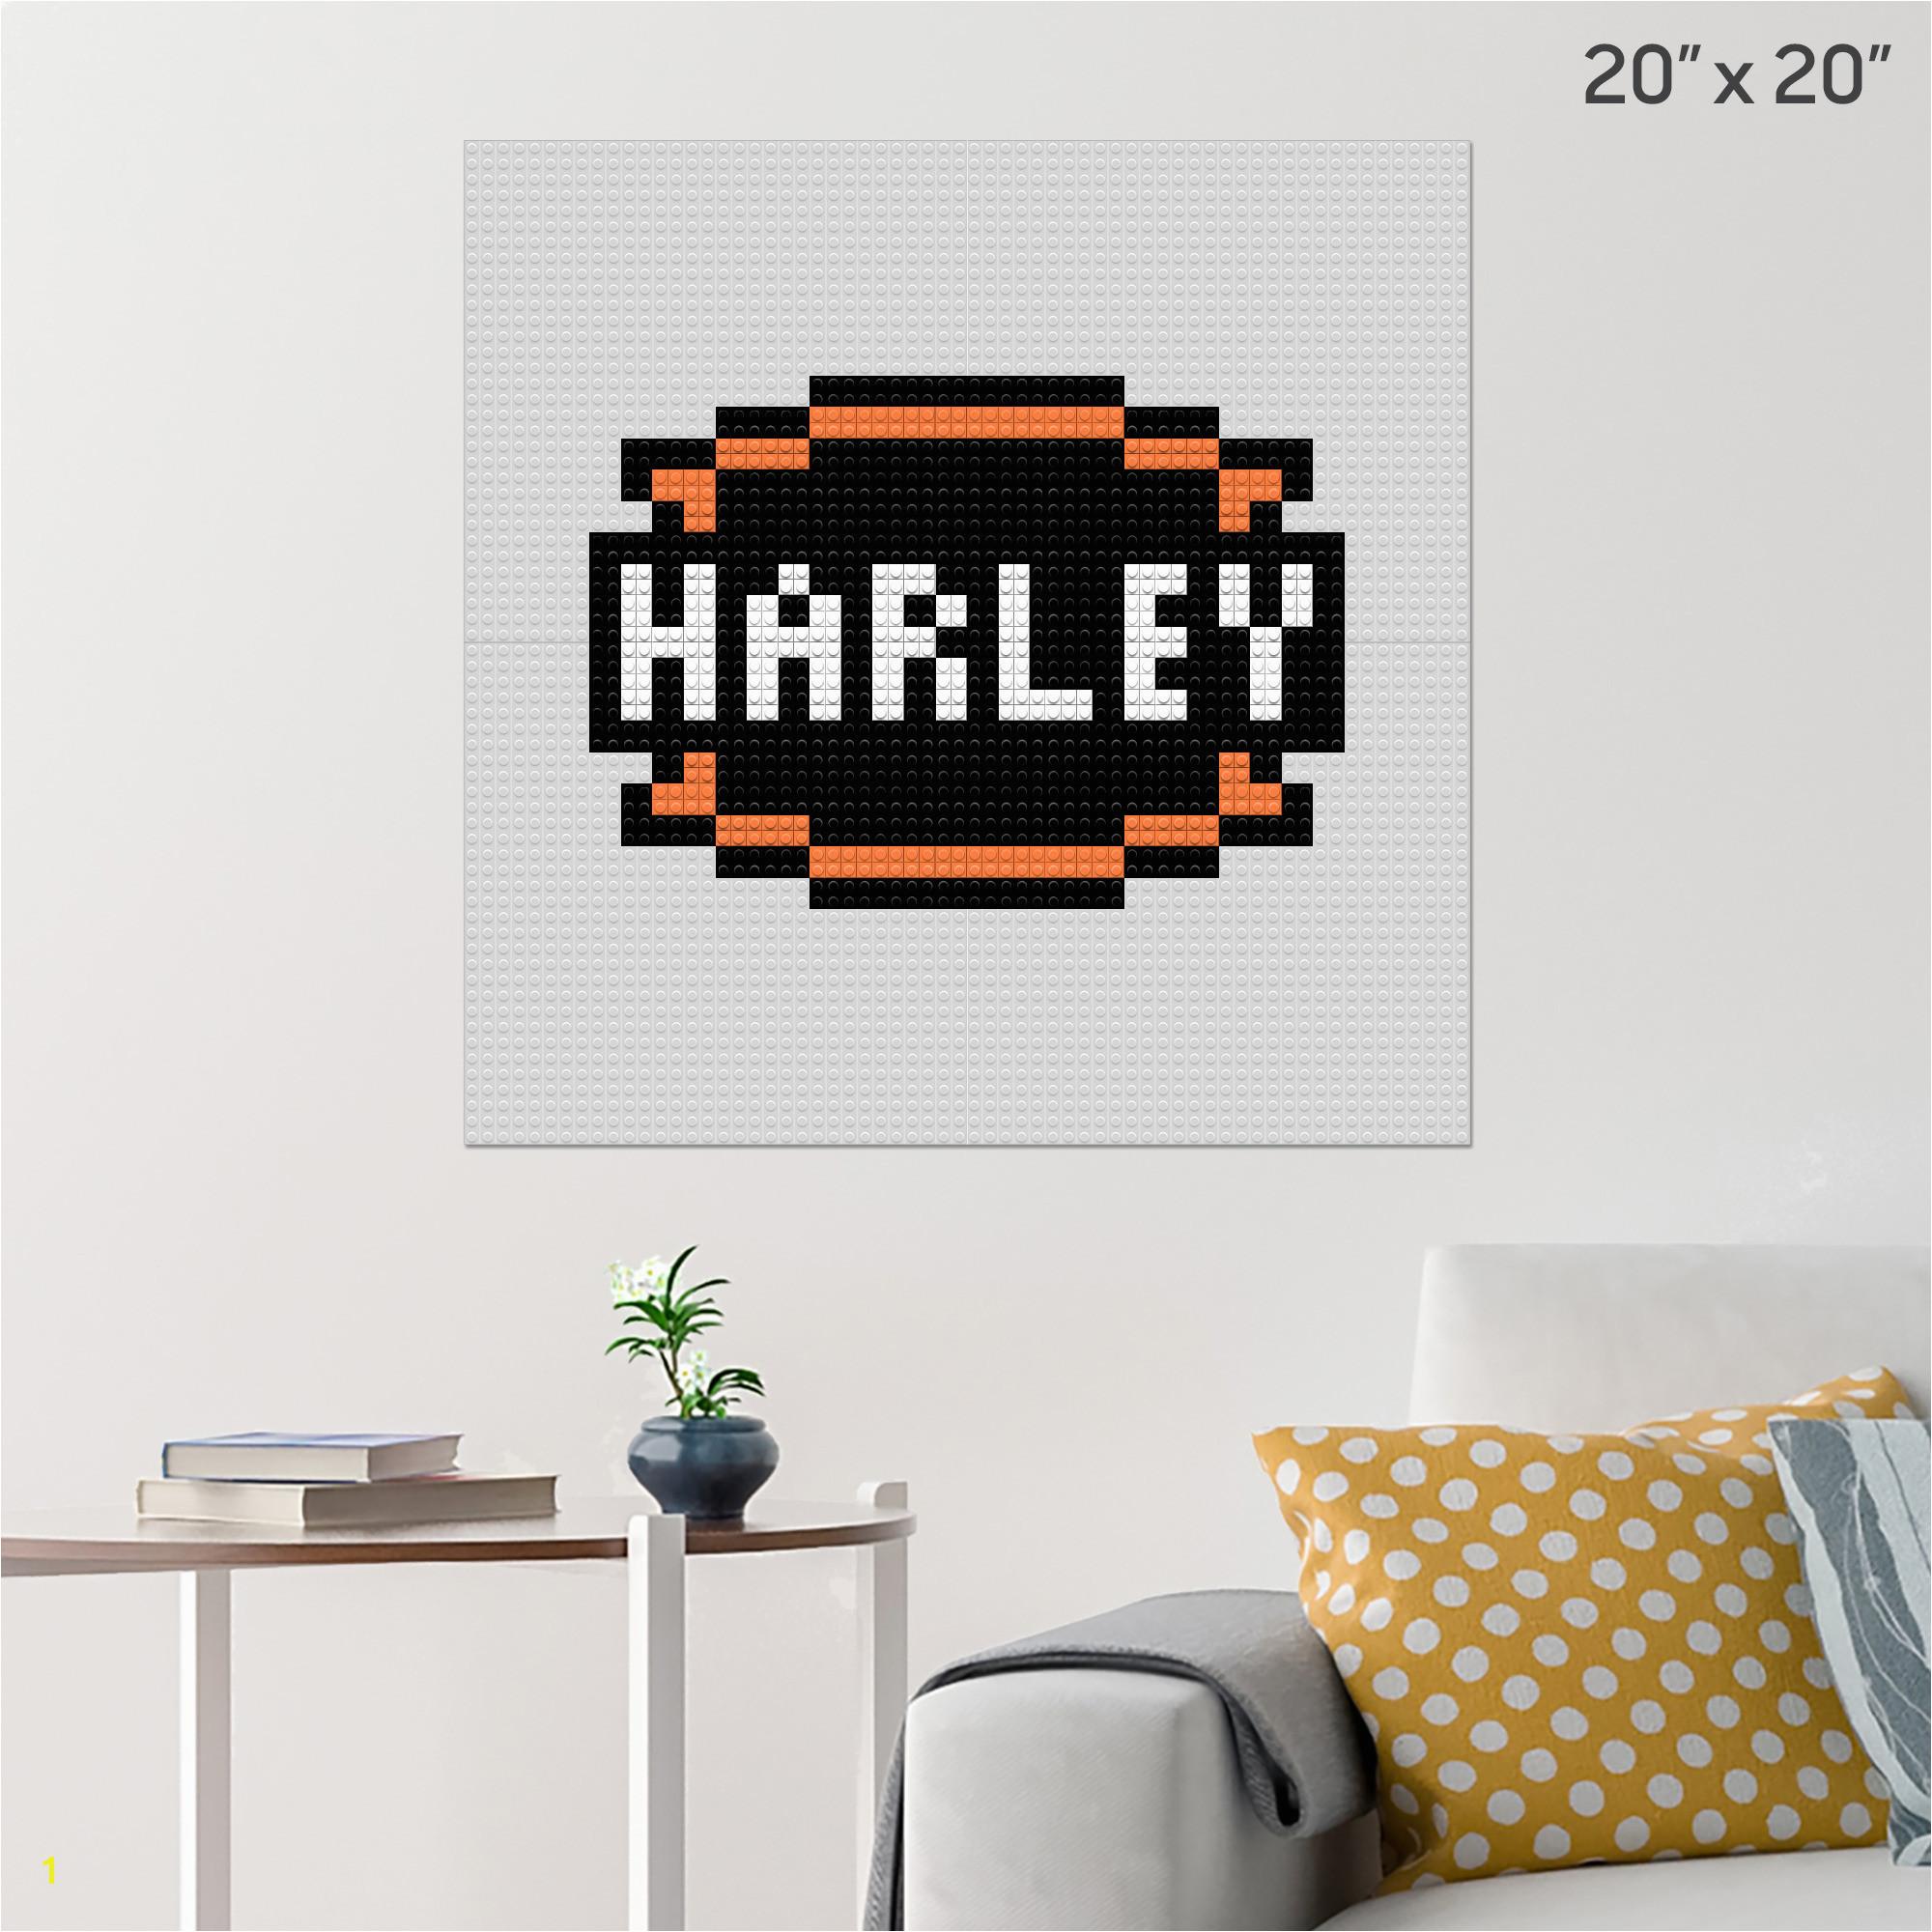 Harley Davidson Wall Murals Harley Davidson Wall Art 2019 Harley Davidson Pixel Art – Brik